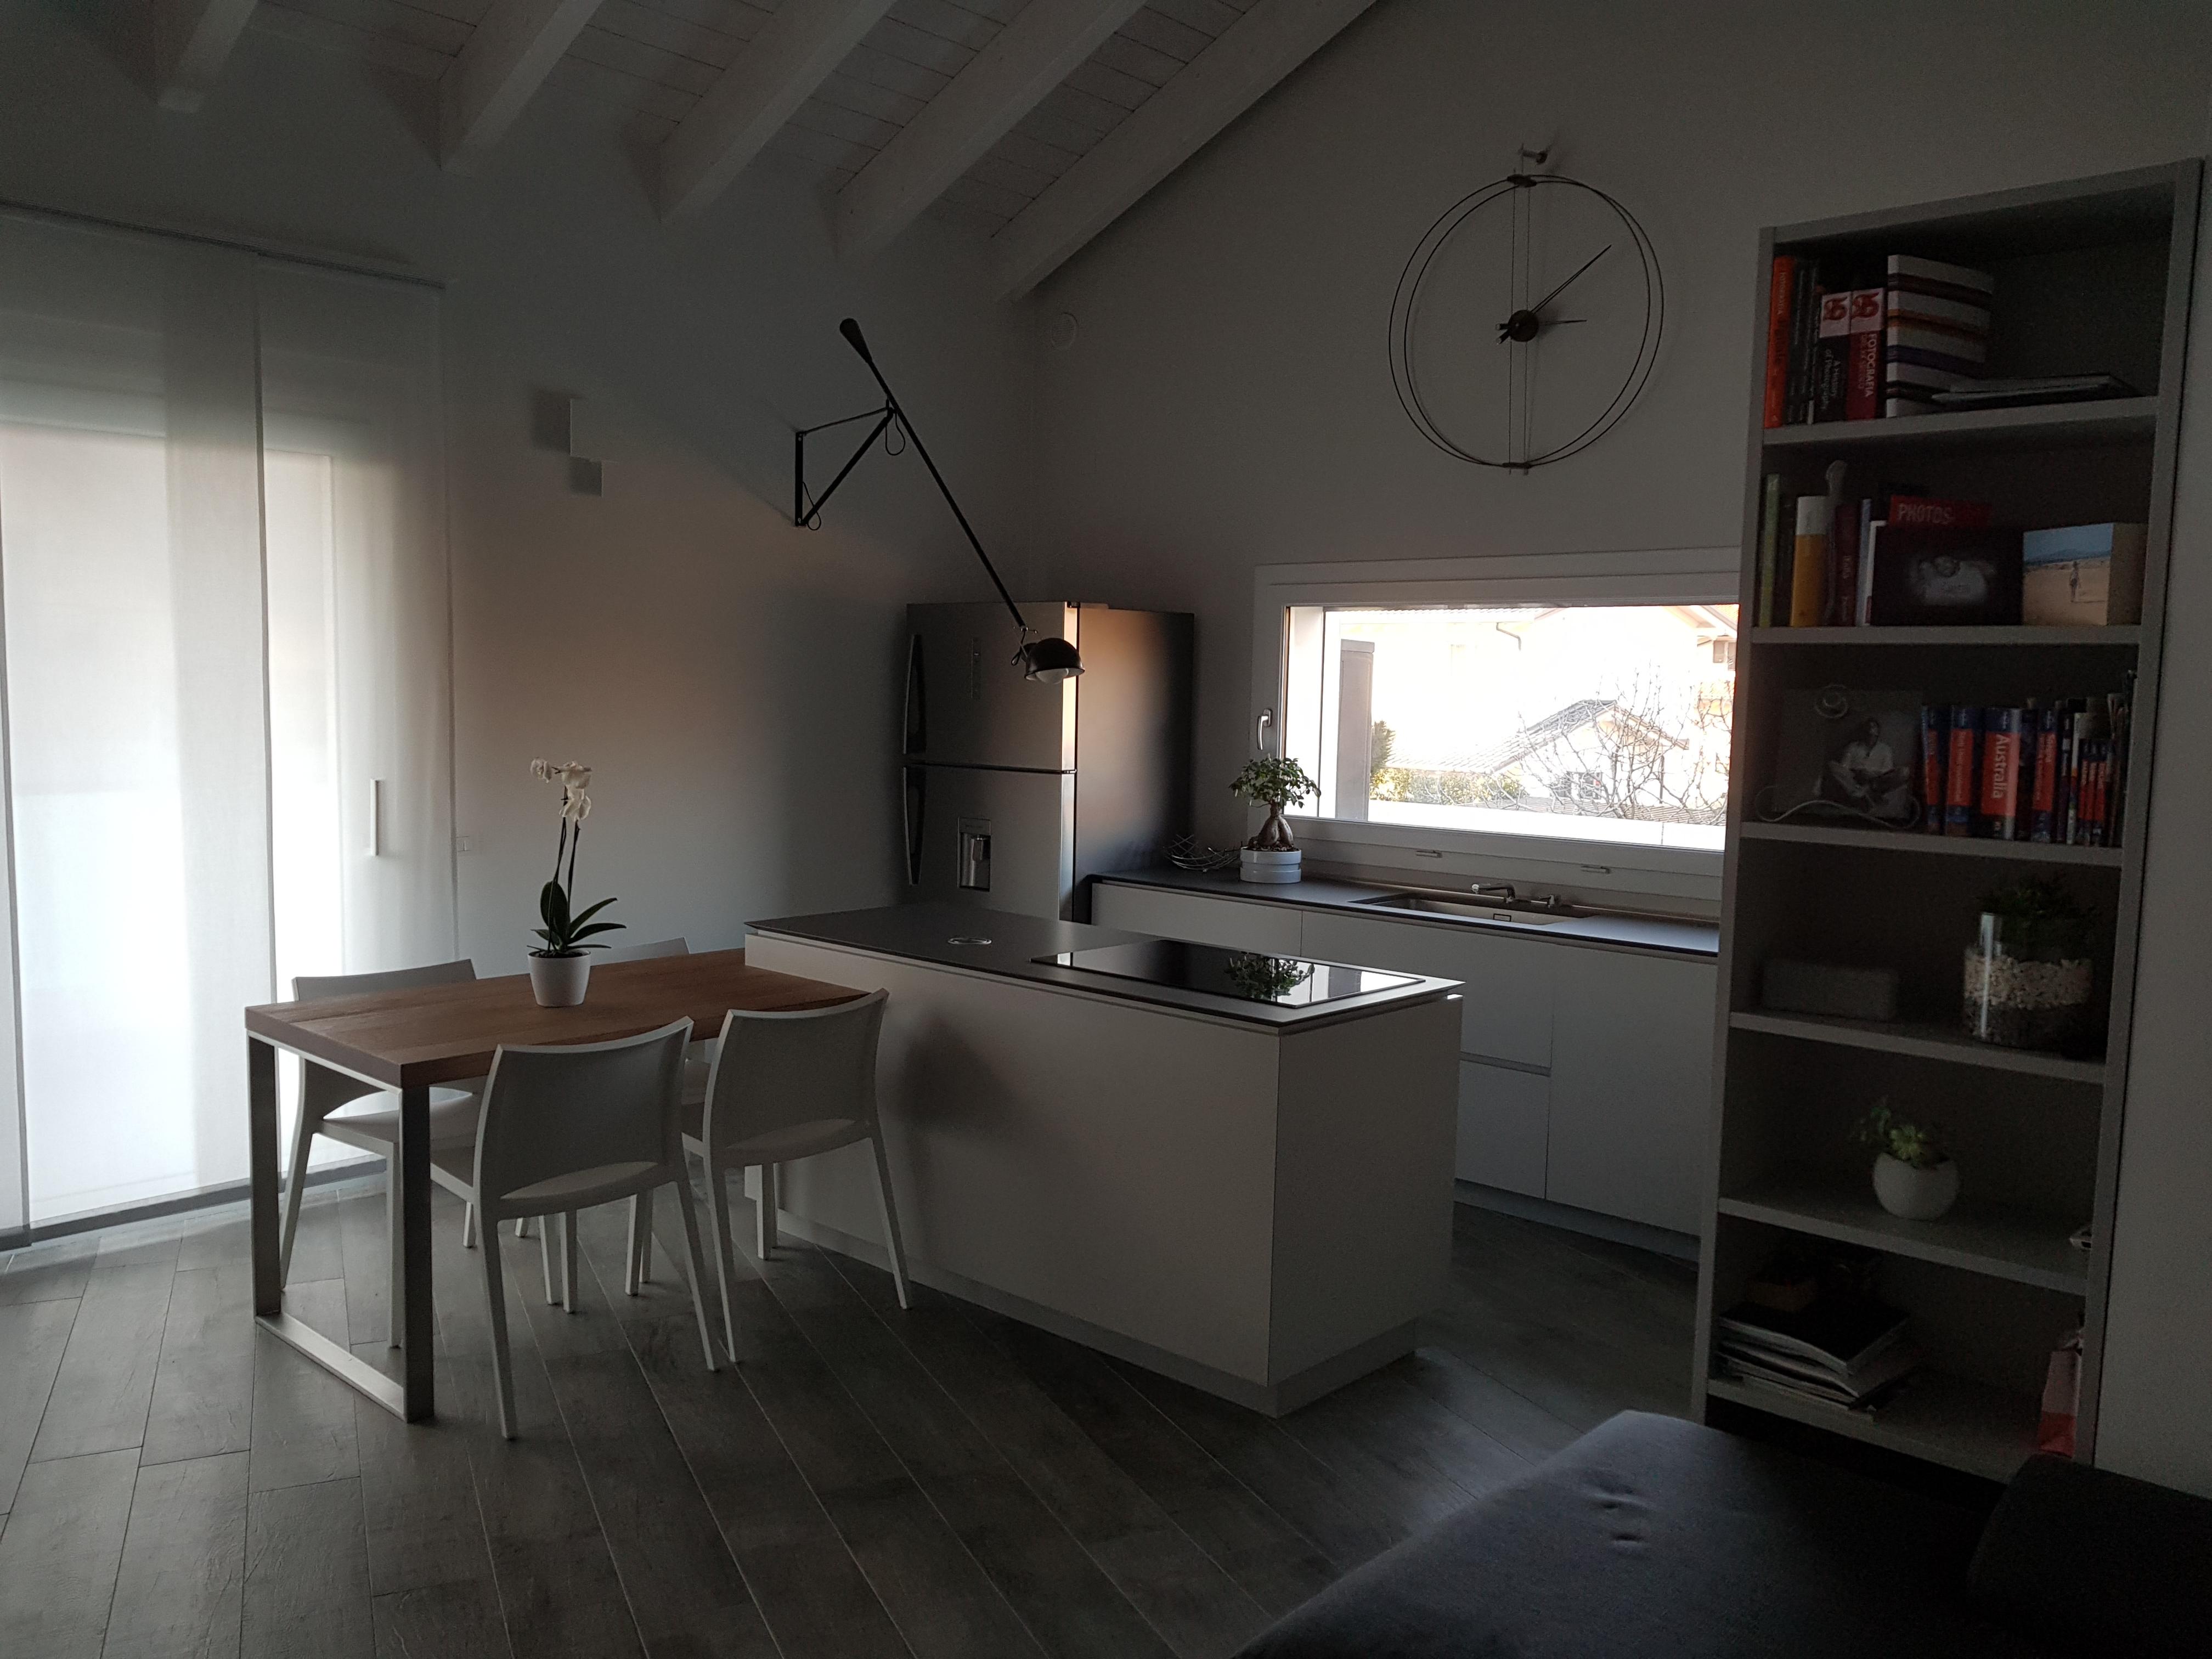 Emejing varenna cucine milano gallery - Cucina artex varenna ...